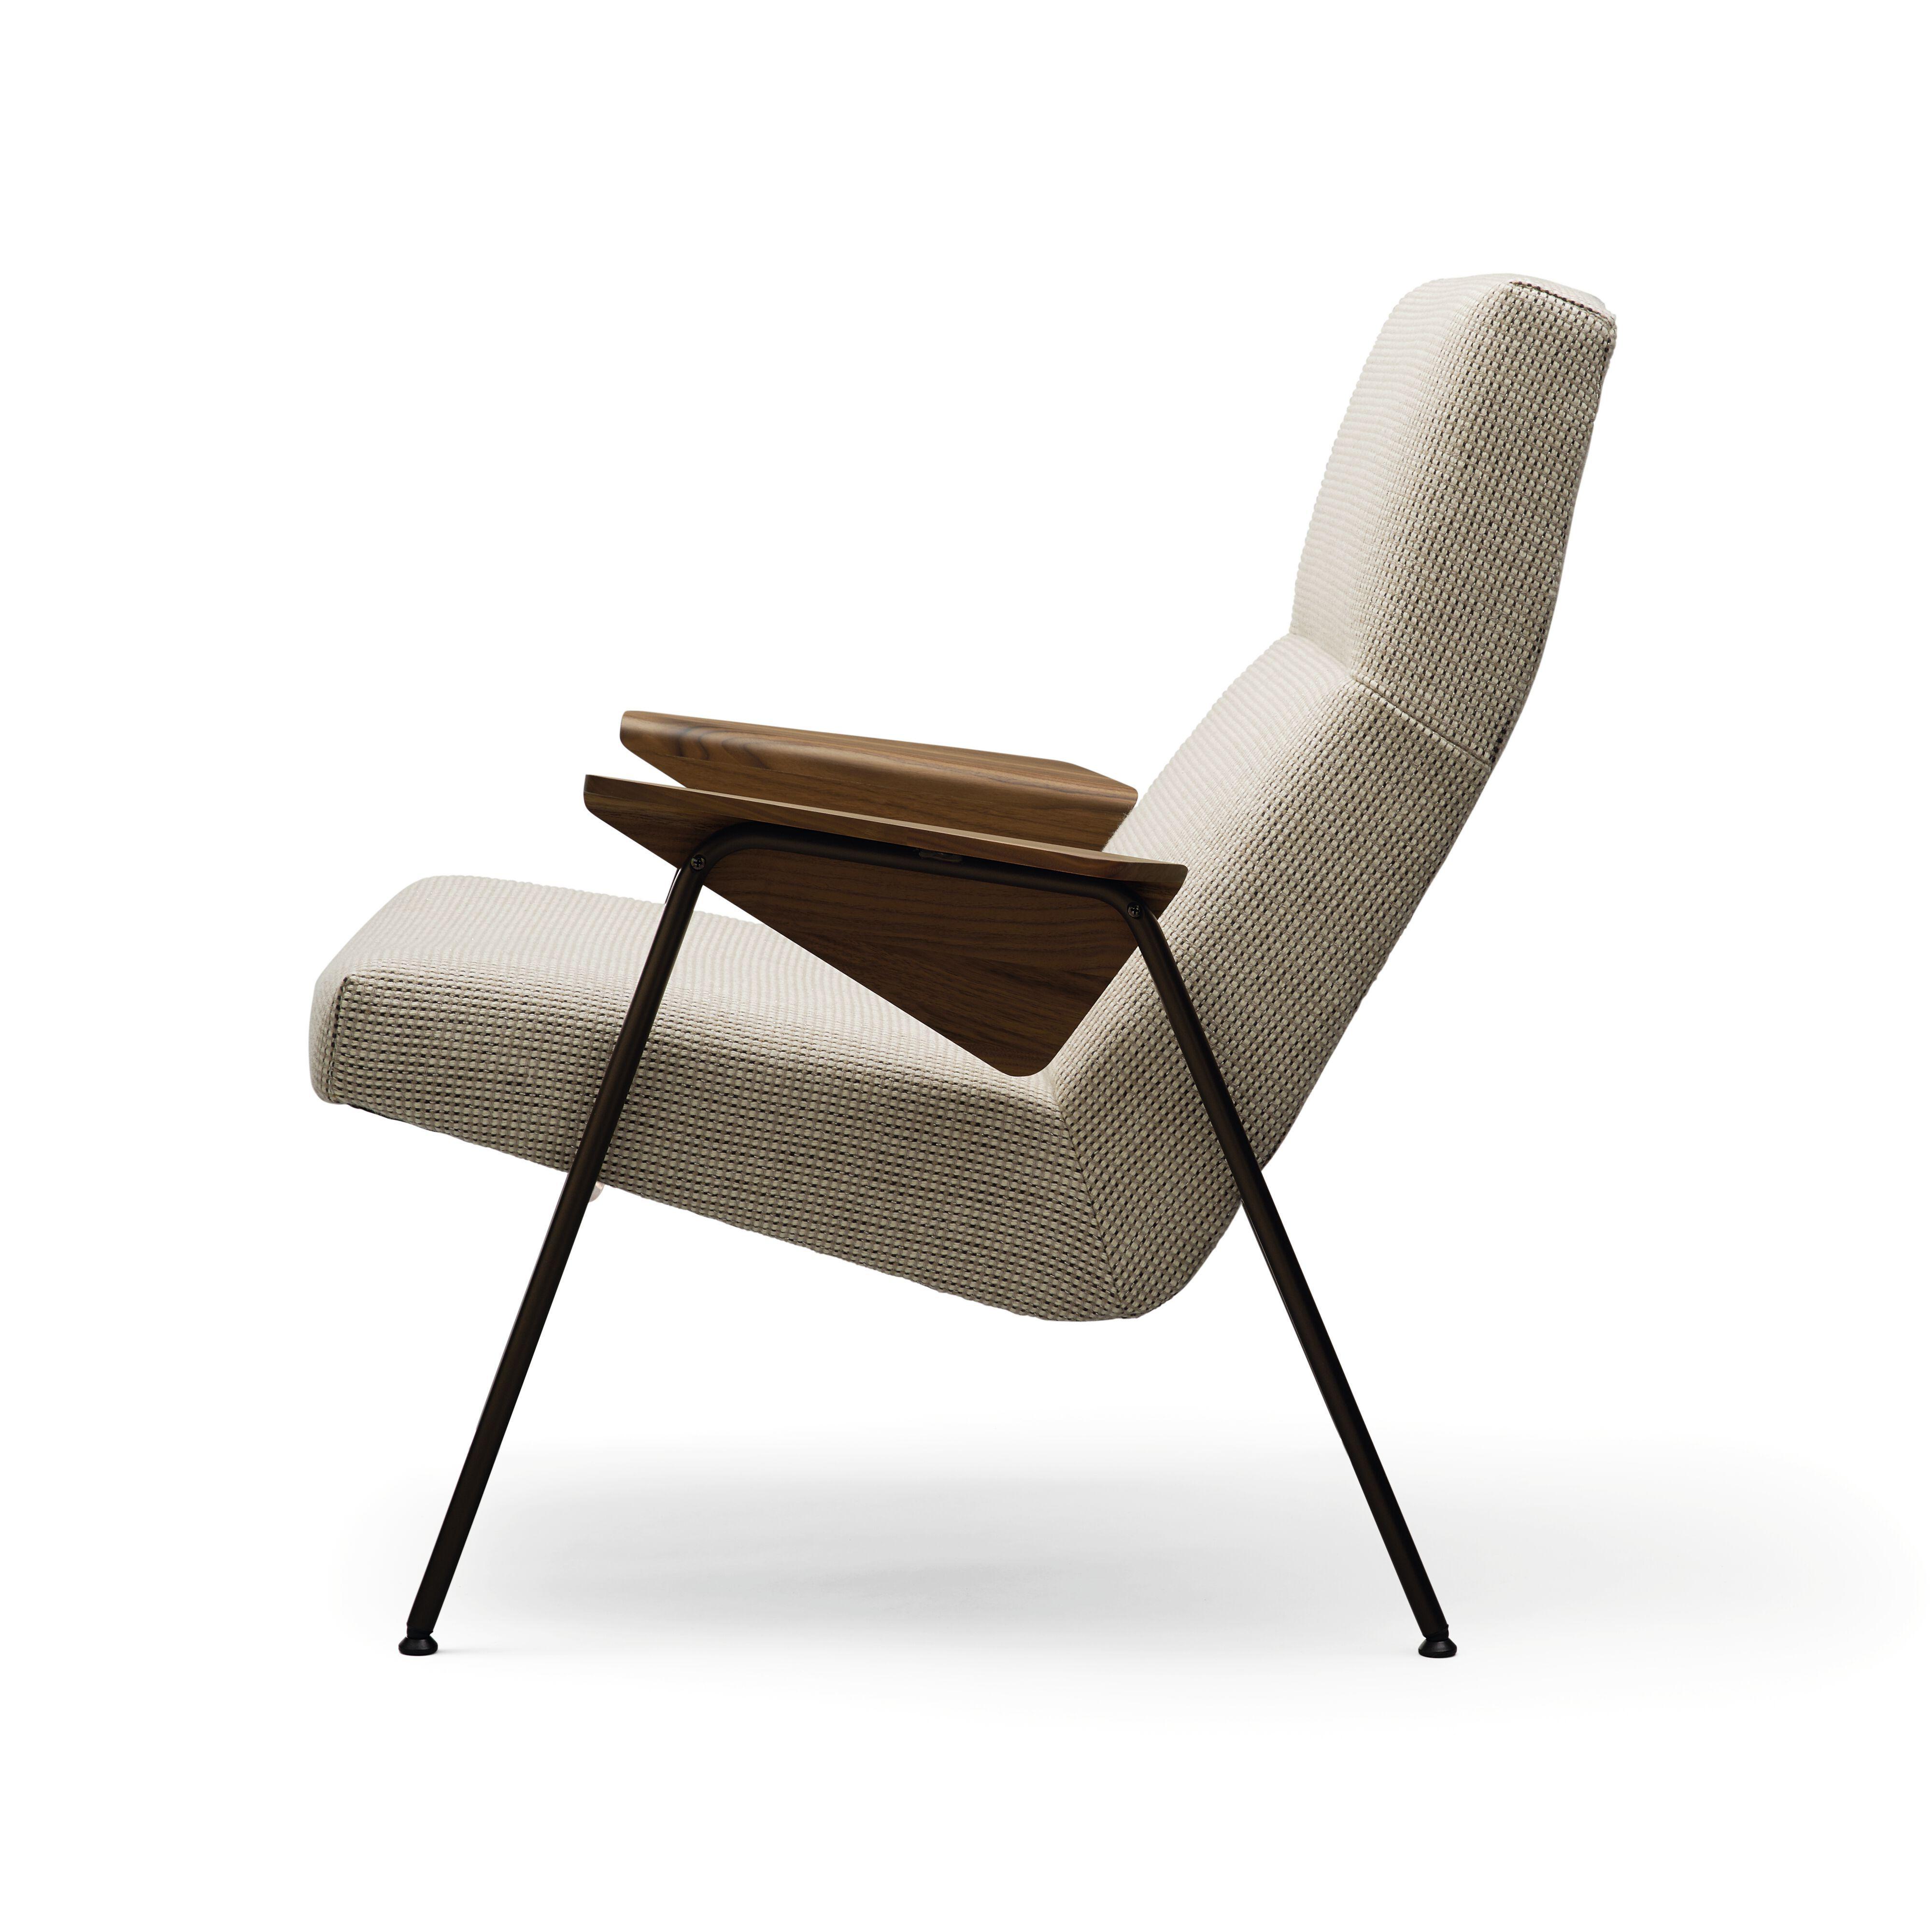 06-WK-Classic_Edition-Votteler_Chair-0010-H.tif